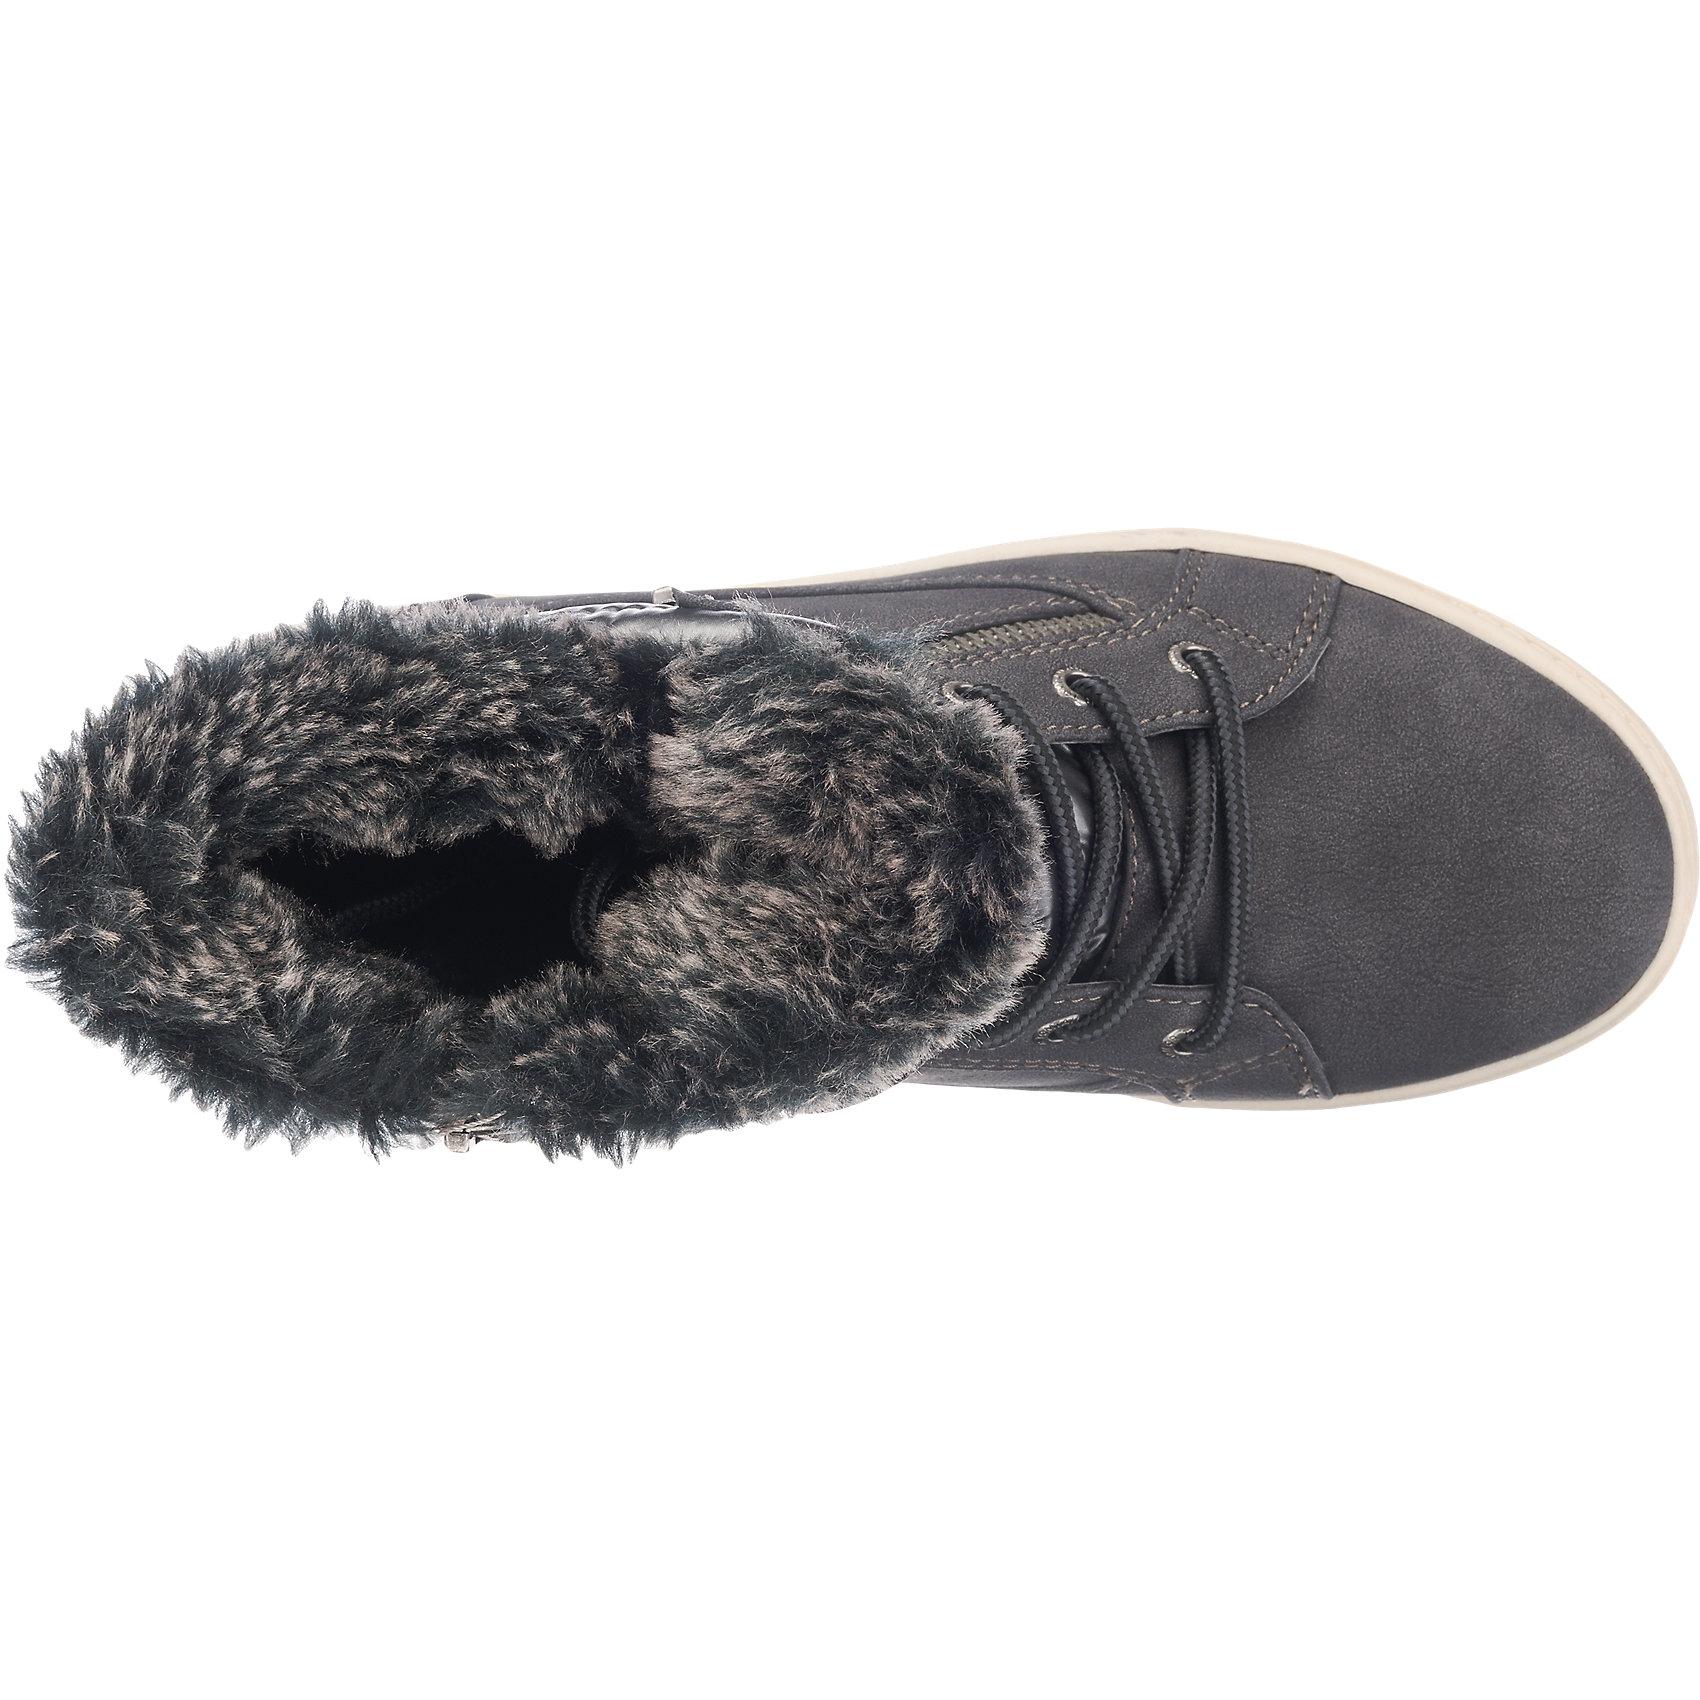 finest selection 19c90 744e0 ... Adidas Tubular Shadow Running Running Running Women s Shoes Size 9.5  5b1f70 ...